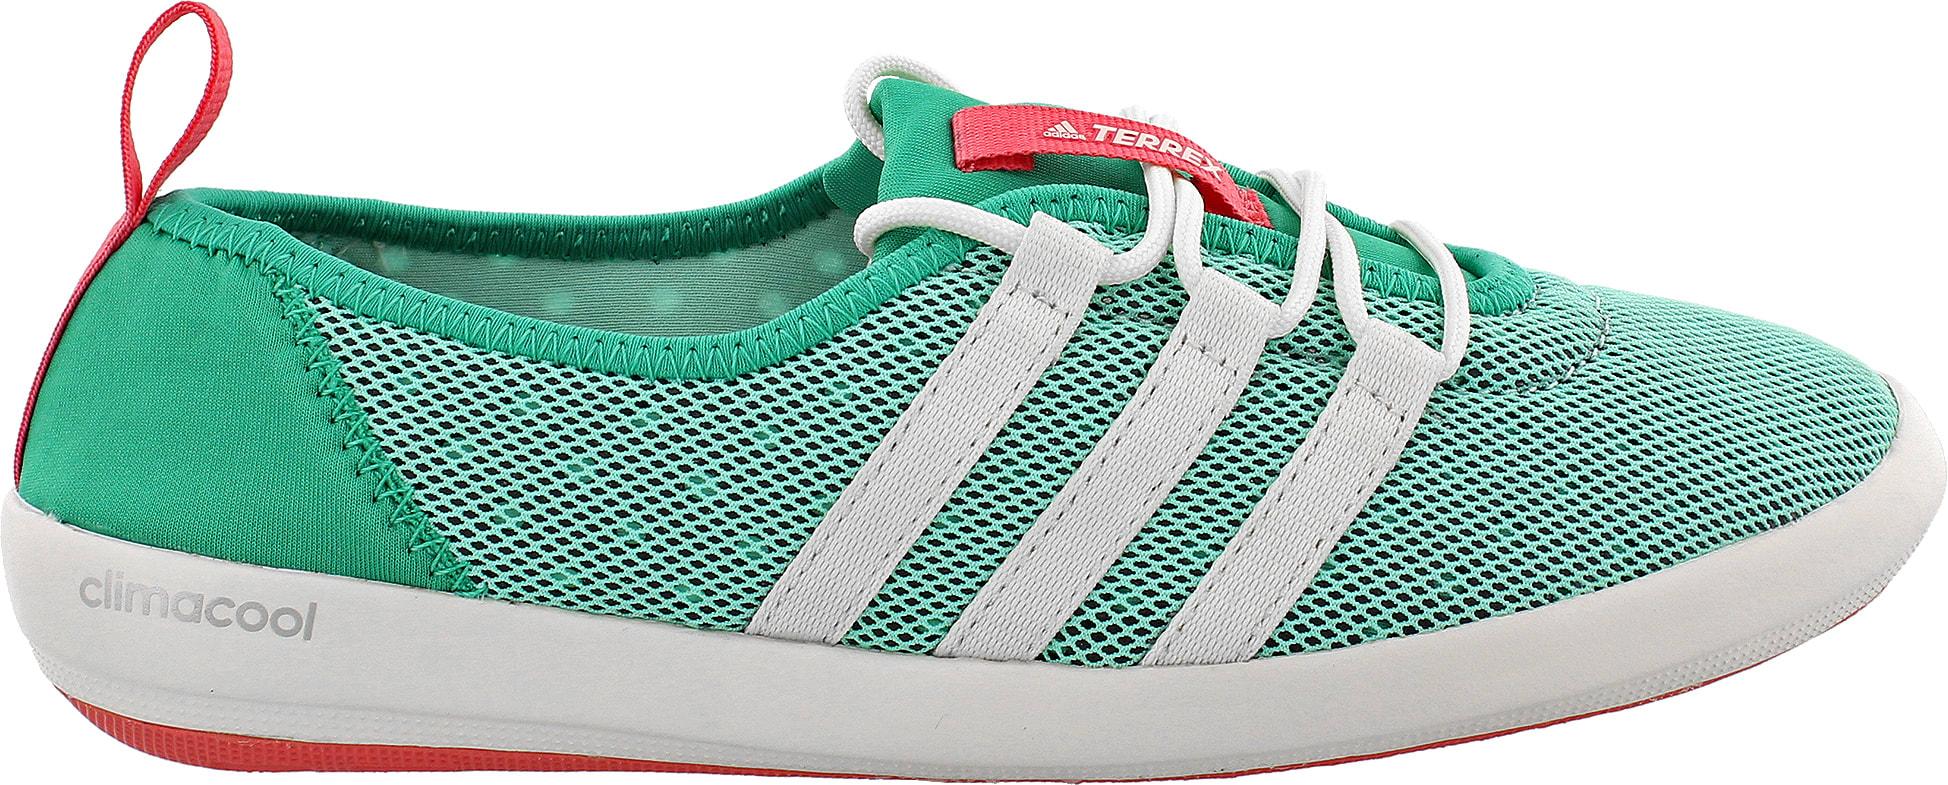 online store b3092 885b5 Adidas Terrex Climacool Boat Sleek Water Shoes - thumbnail 1